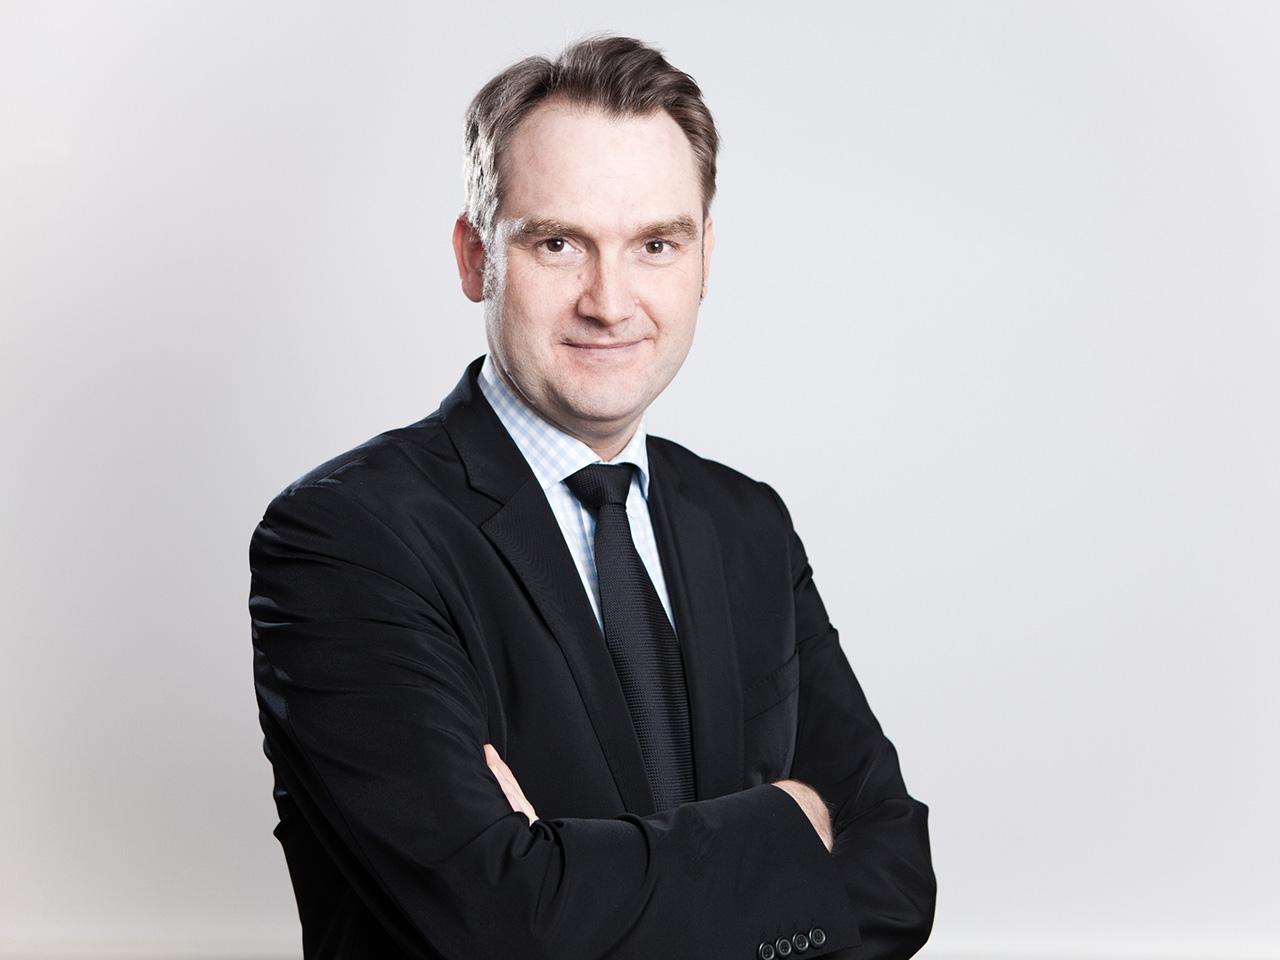 Oliver Grün, Präsident BITMi. (Bild: Bundesverband IT-Mittelstand)